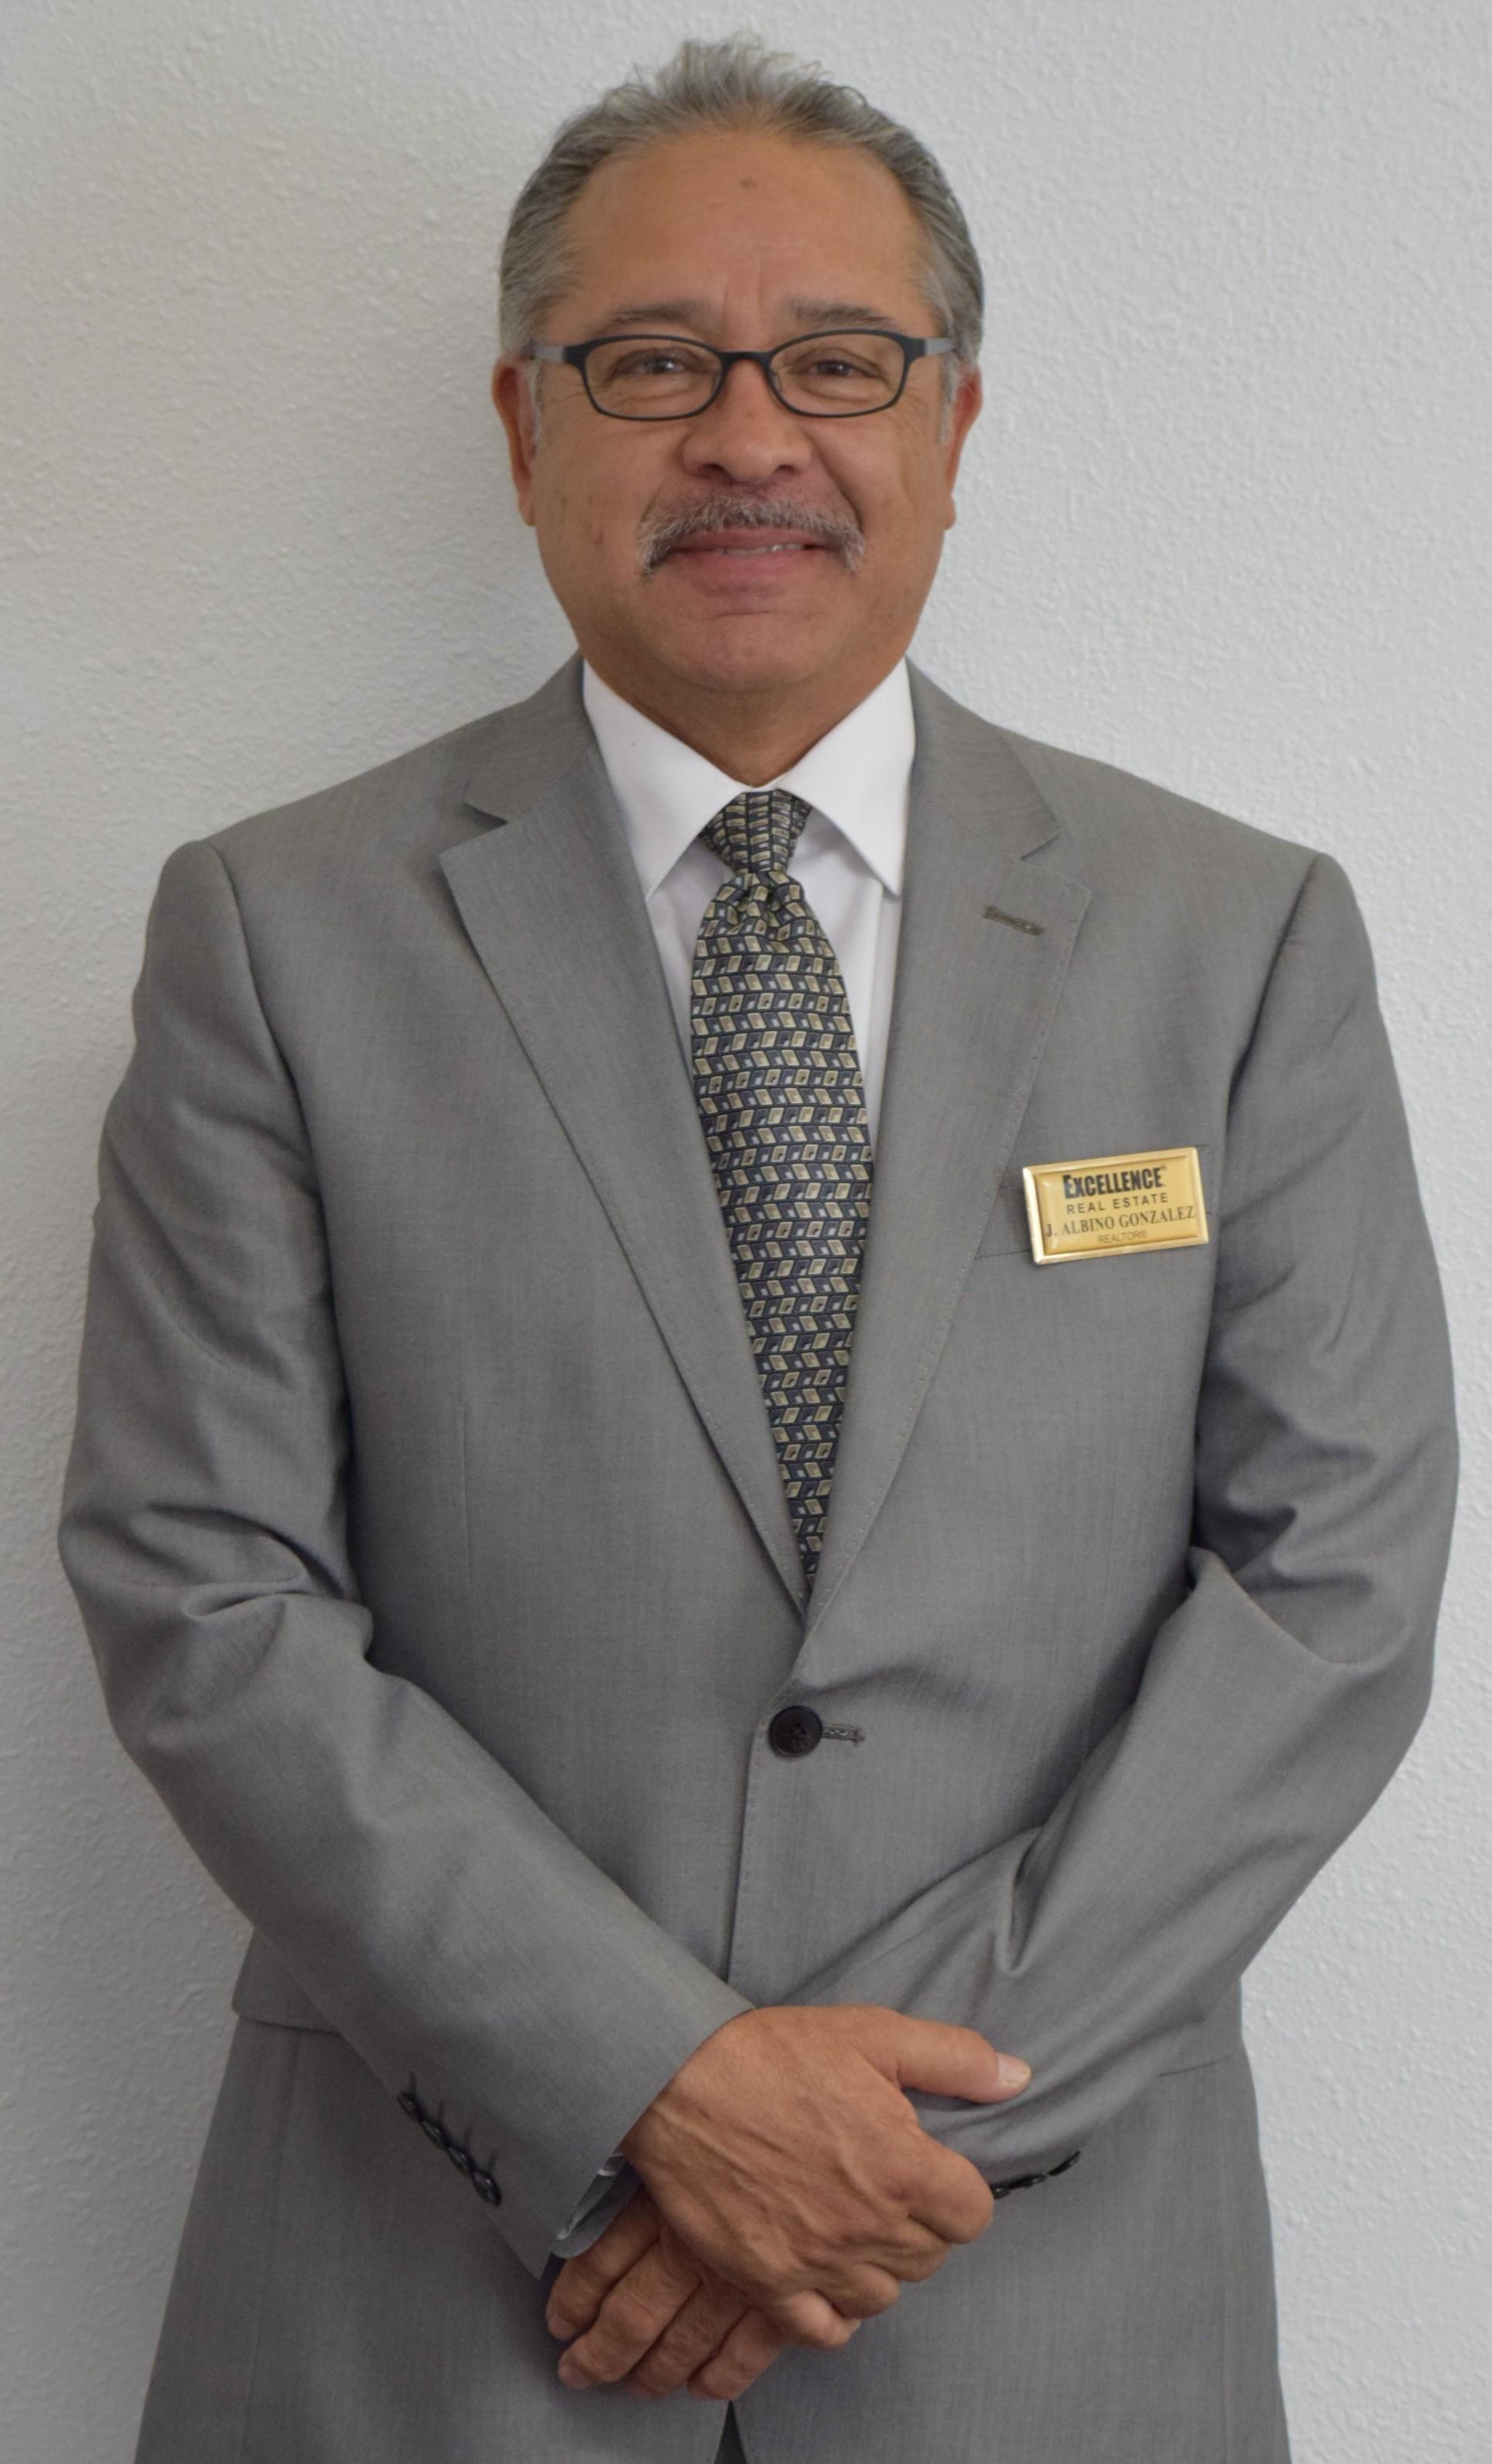 J. ALBINO GONZALEZ